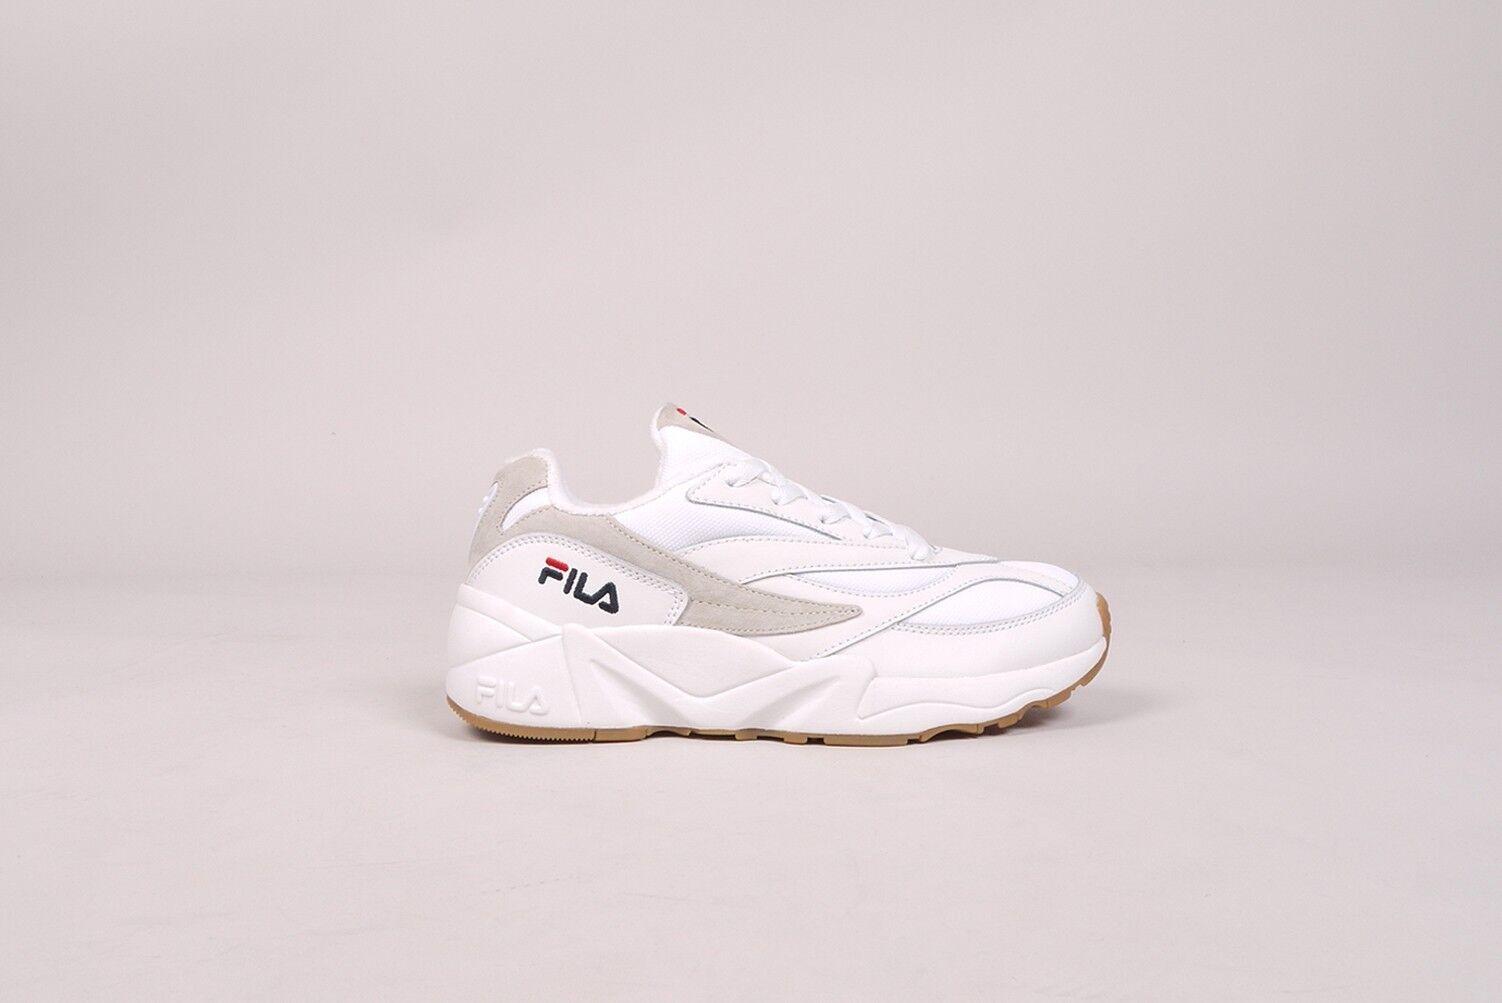 FILA Venom Low v94m Women EU 42 US 10.5 Sneaker Womens shoes Wmns Disrupter